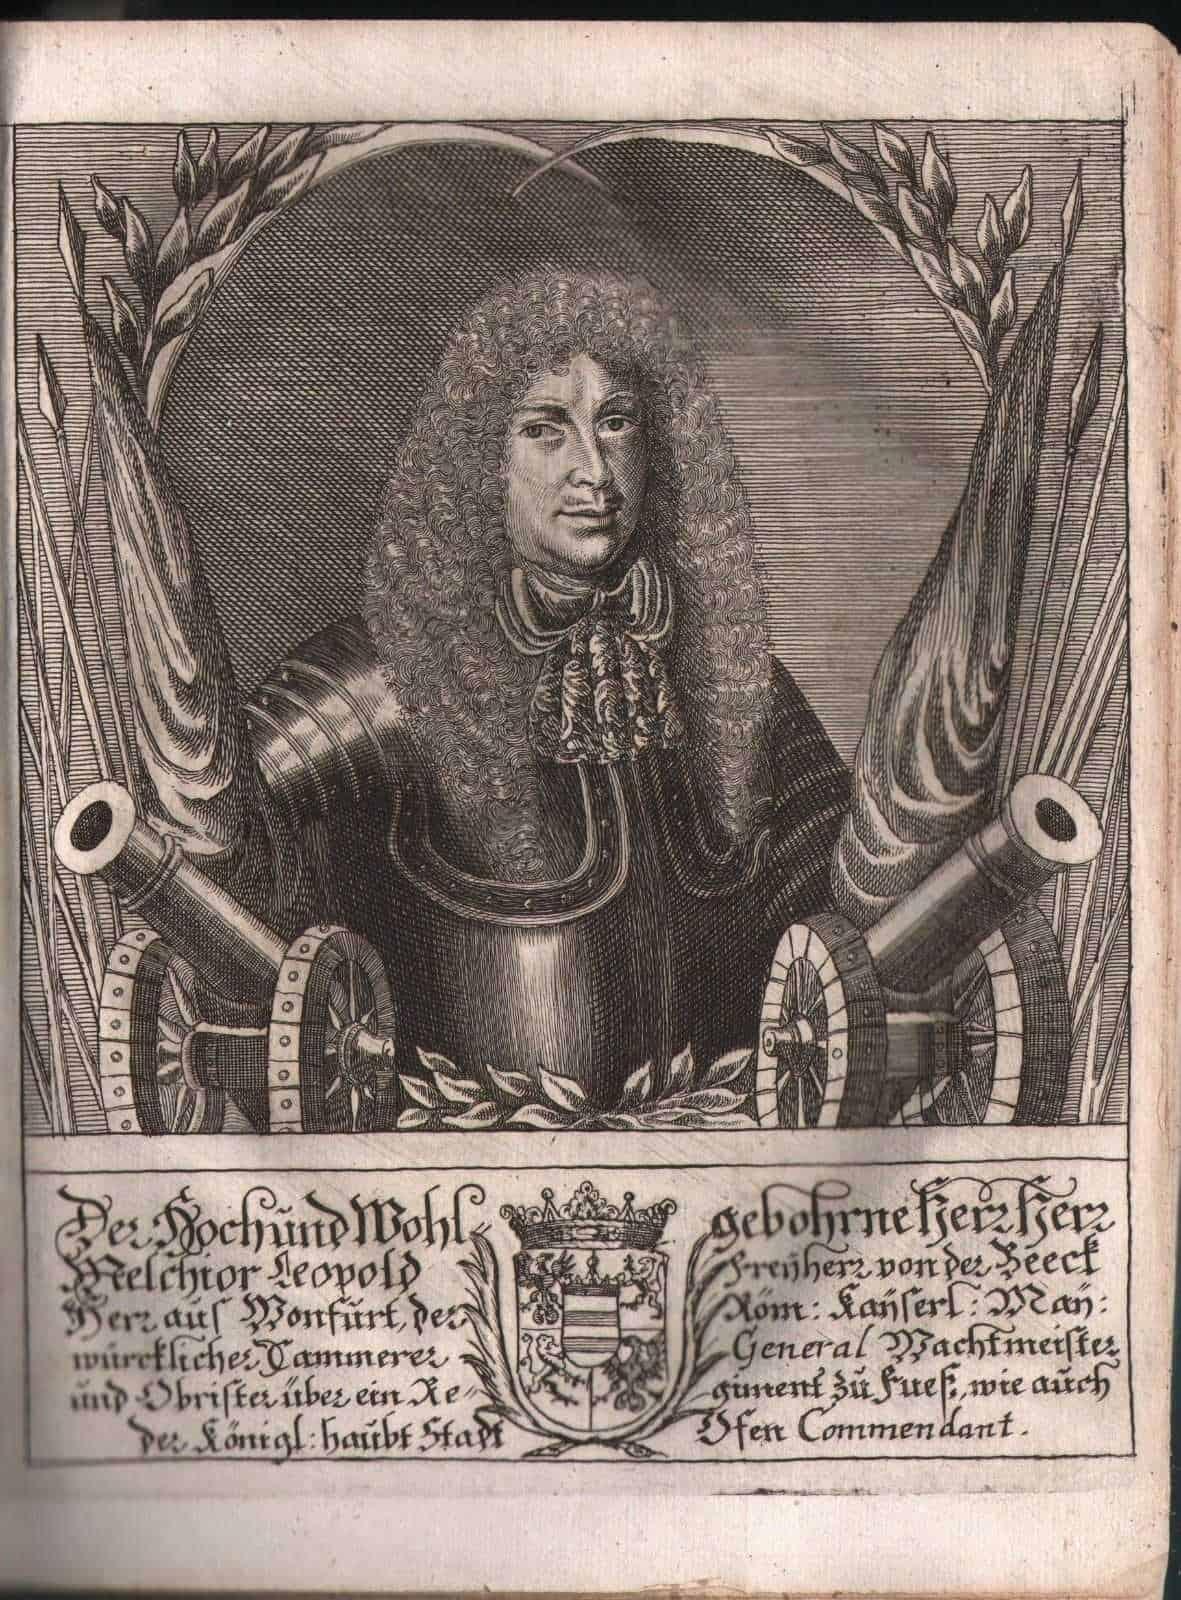 1688-Boethius-TRIUMPH-LEUCHTENDEN-KRIEGS-HELMS-Vol-3-History-Christian-Ottoman-401133054023-6